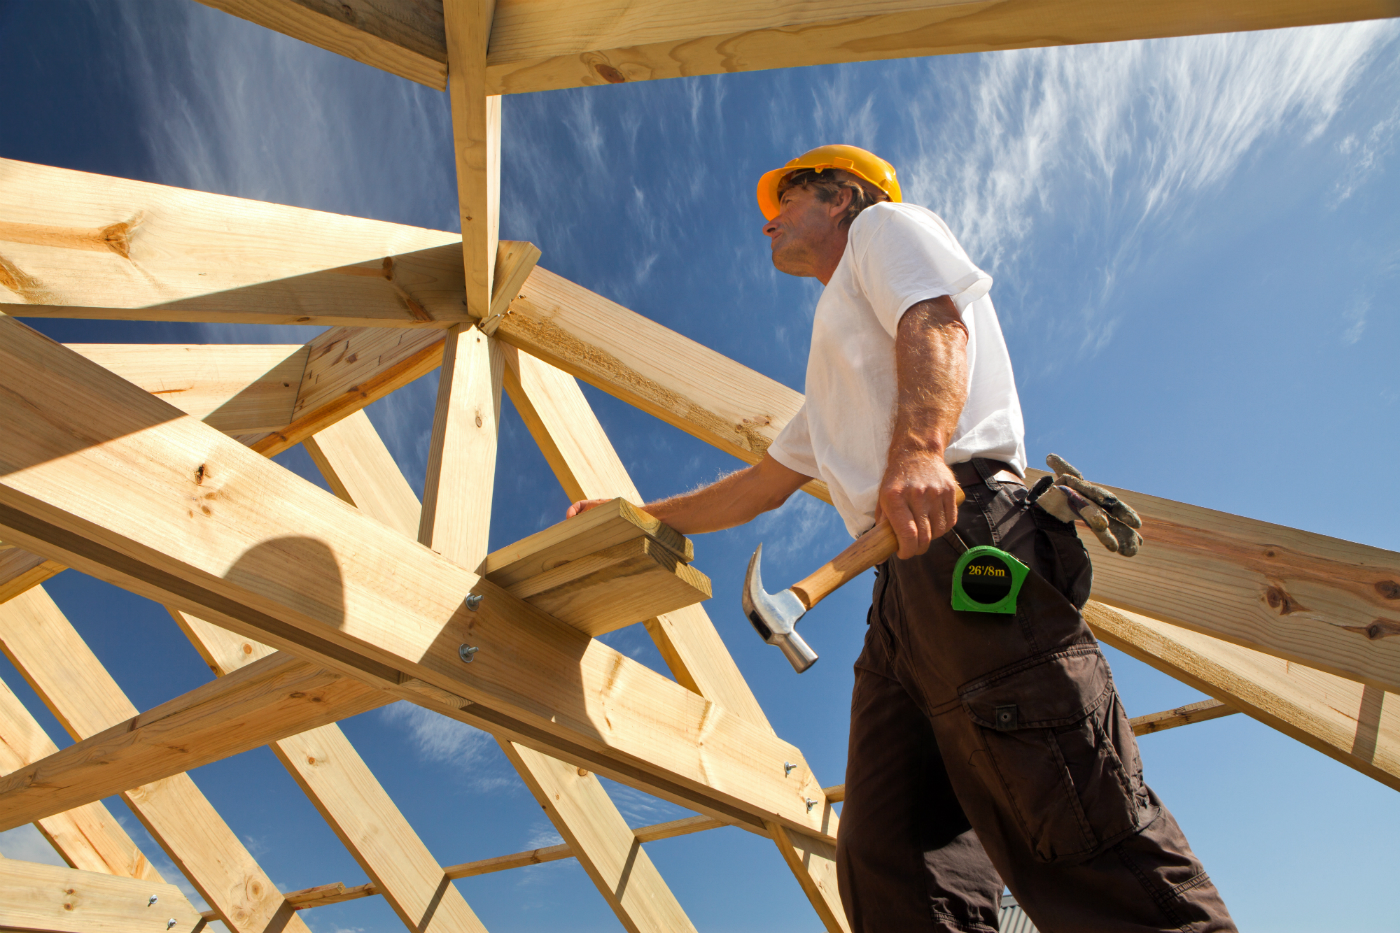 The Ultimate Carpenter Tool Belt Holder